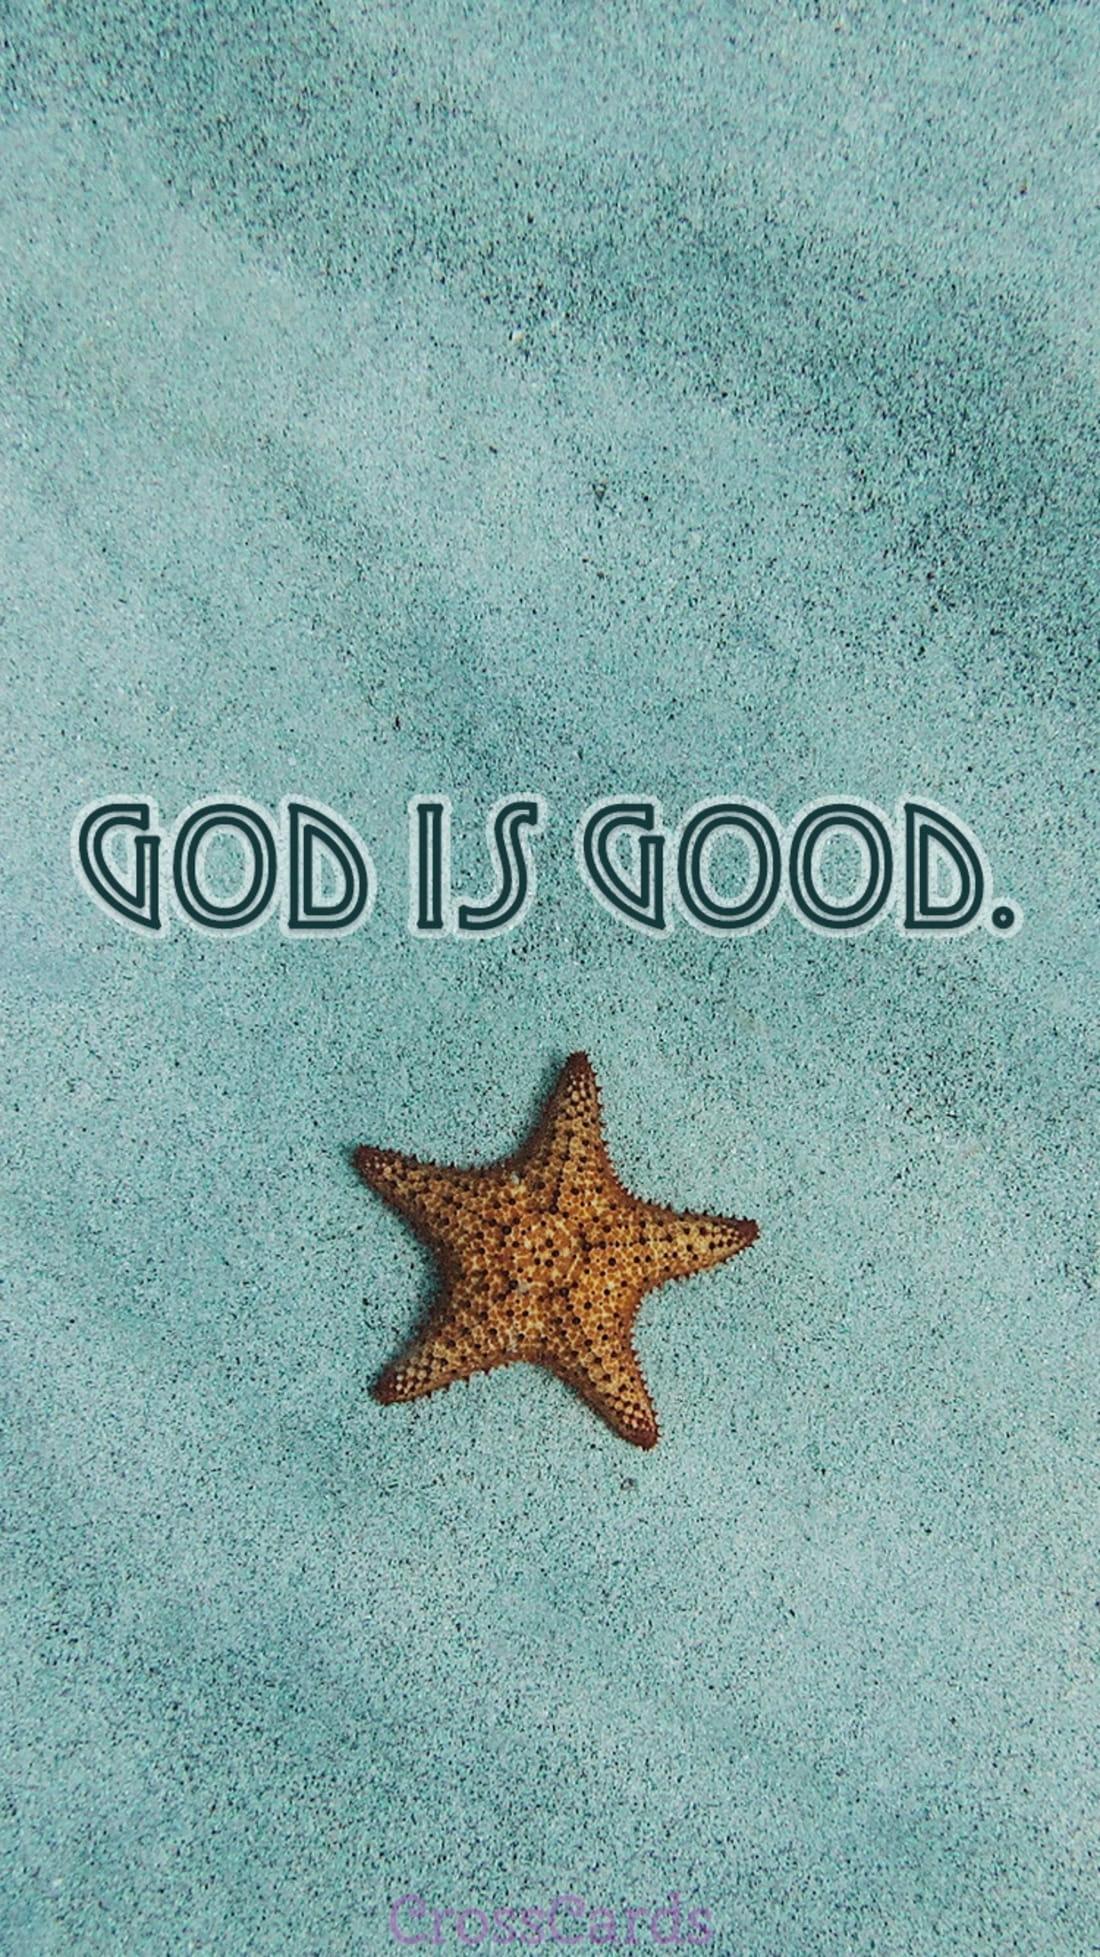 God is Good mobile phone wallpaper